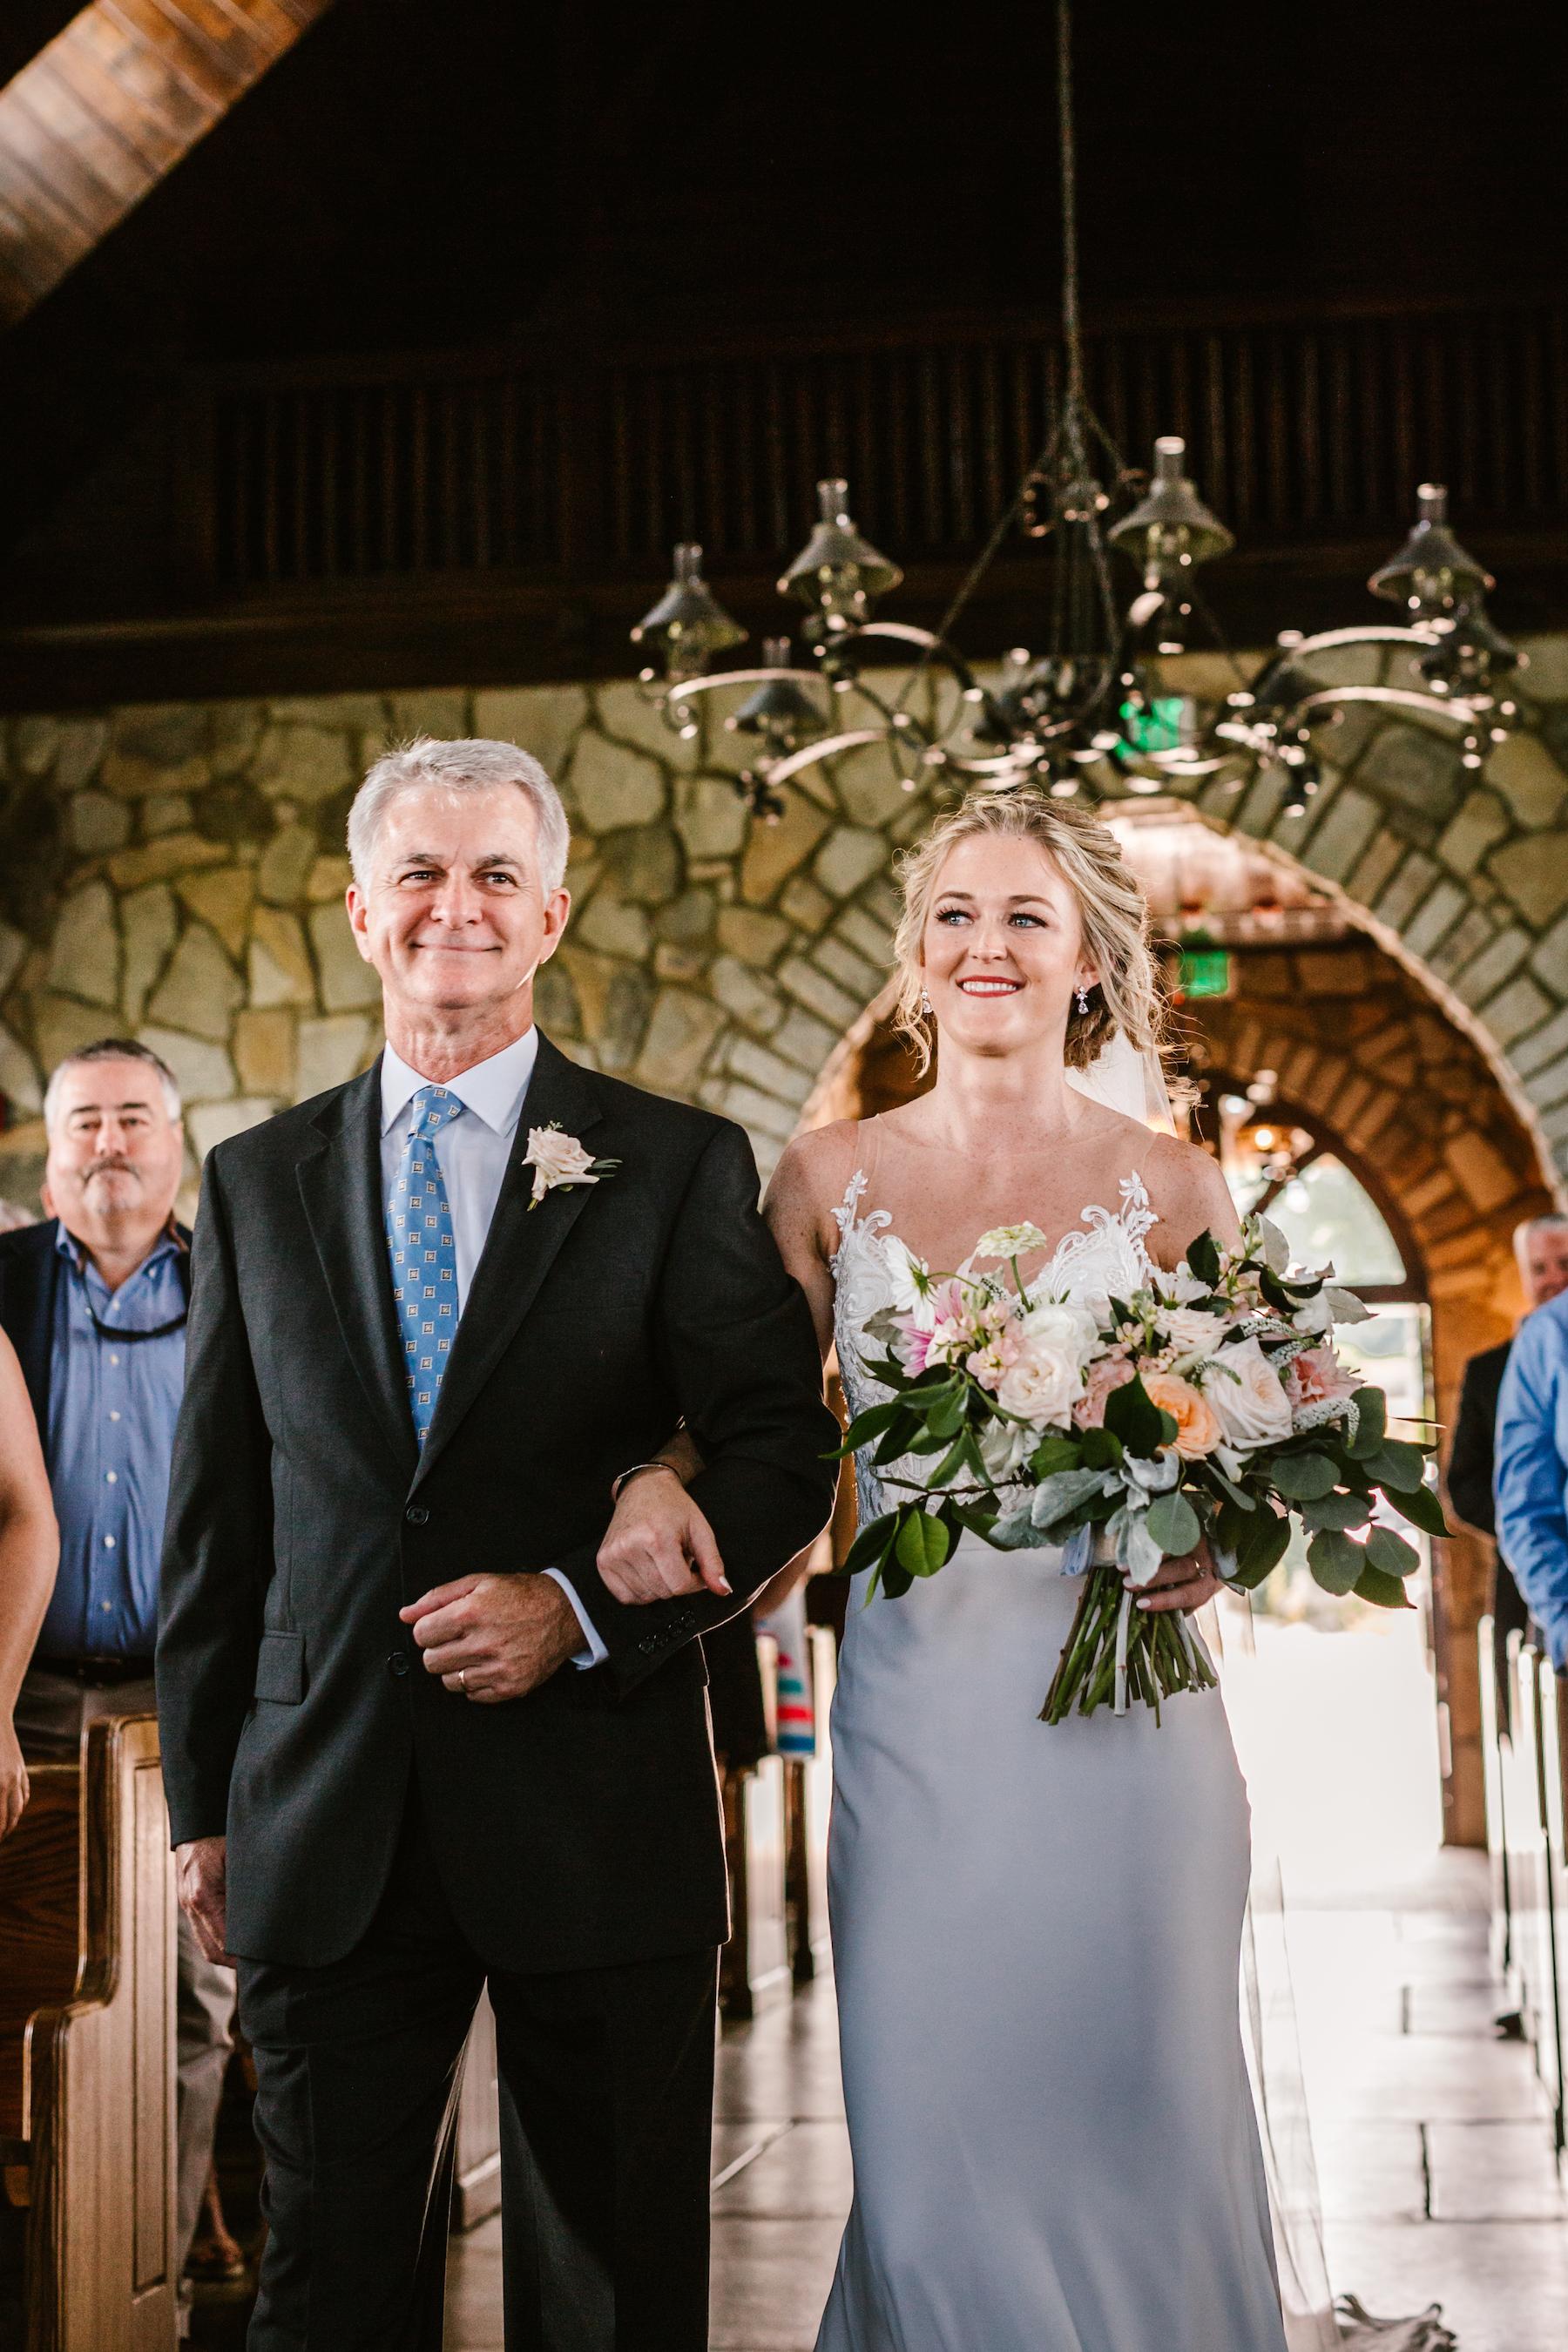 wedding-engagement-photographer-spartanburg-greenville-columbia-carolina-south-north-483.JPG